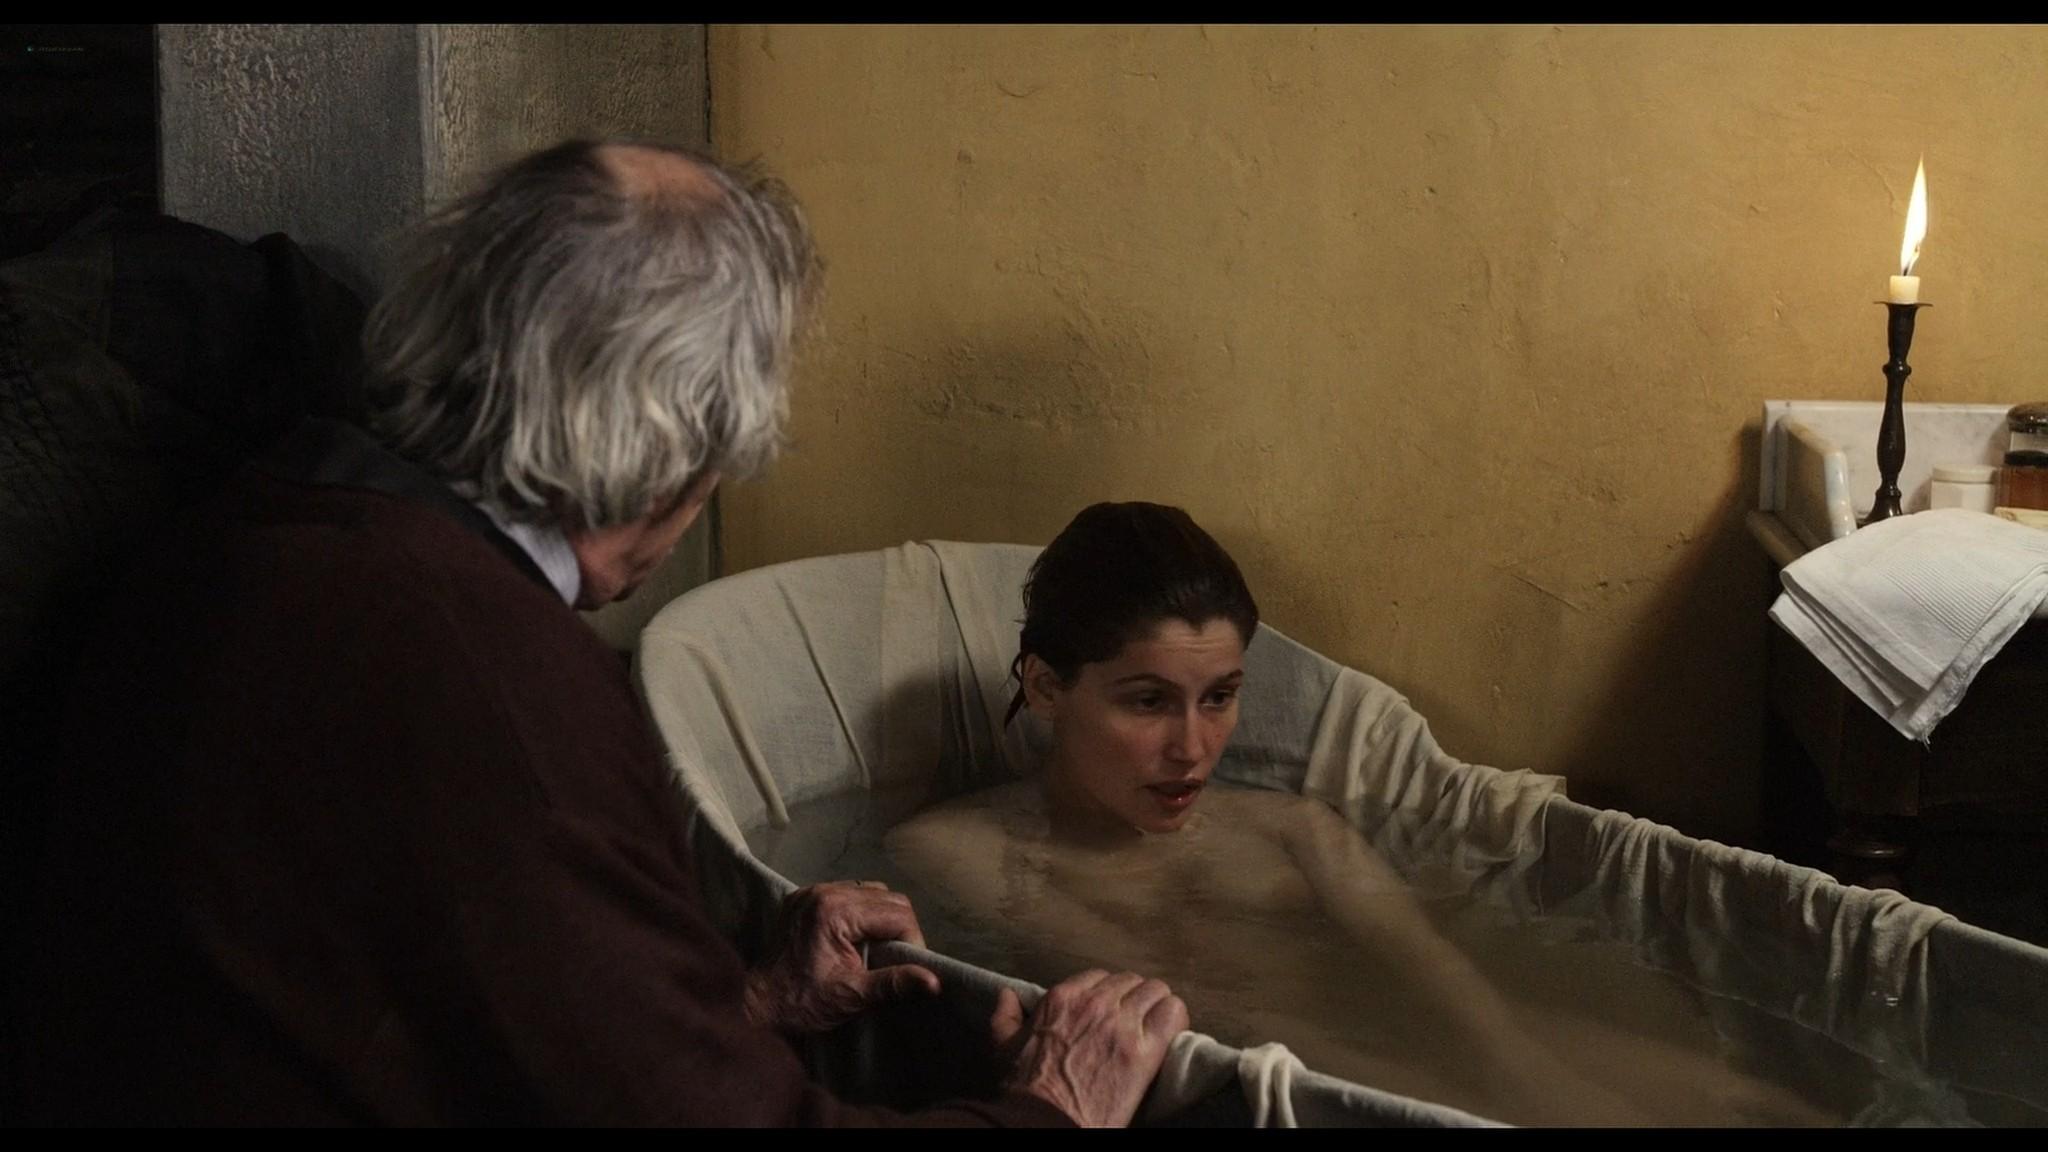 Laetitia Casta nude topless and very hot La jeune fille et les loups 2007 HD 1080p BluRay 11